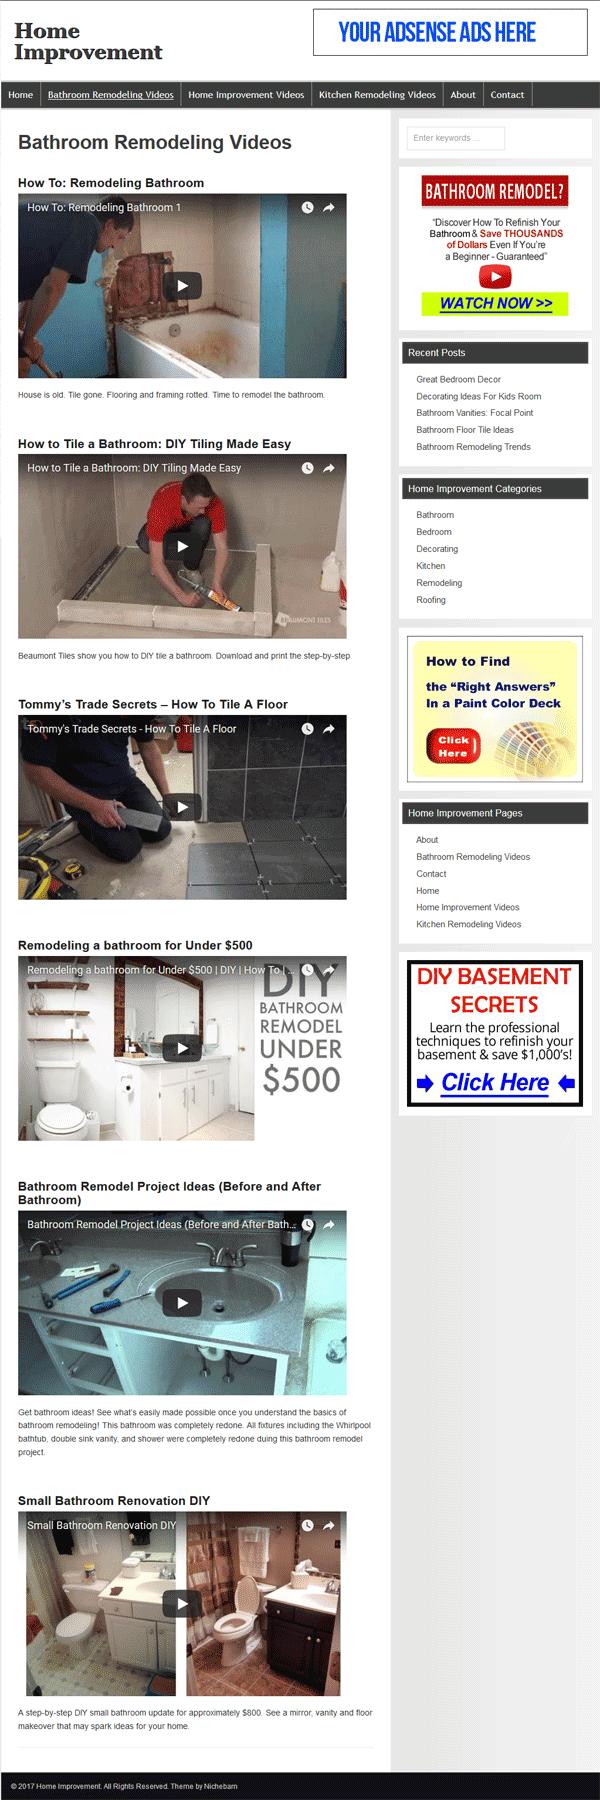 Home Improvement PLR Website |